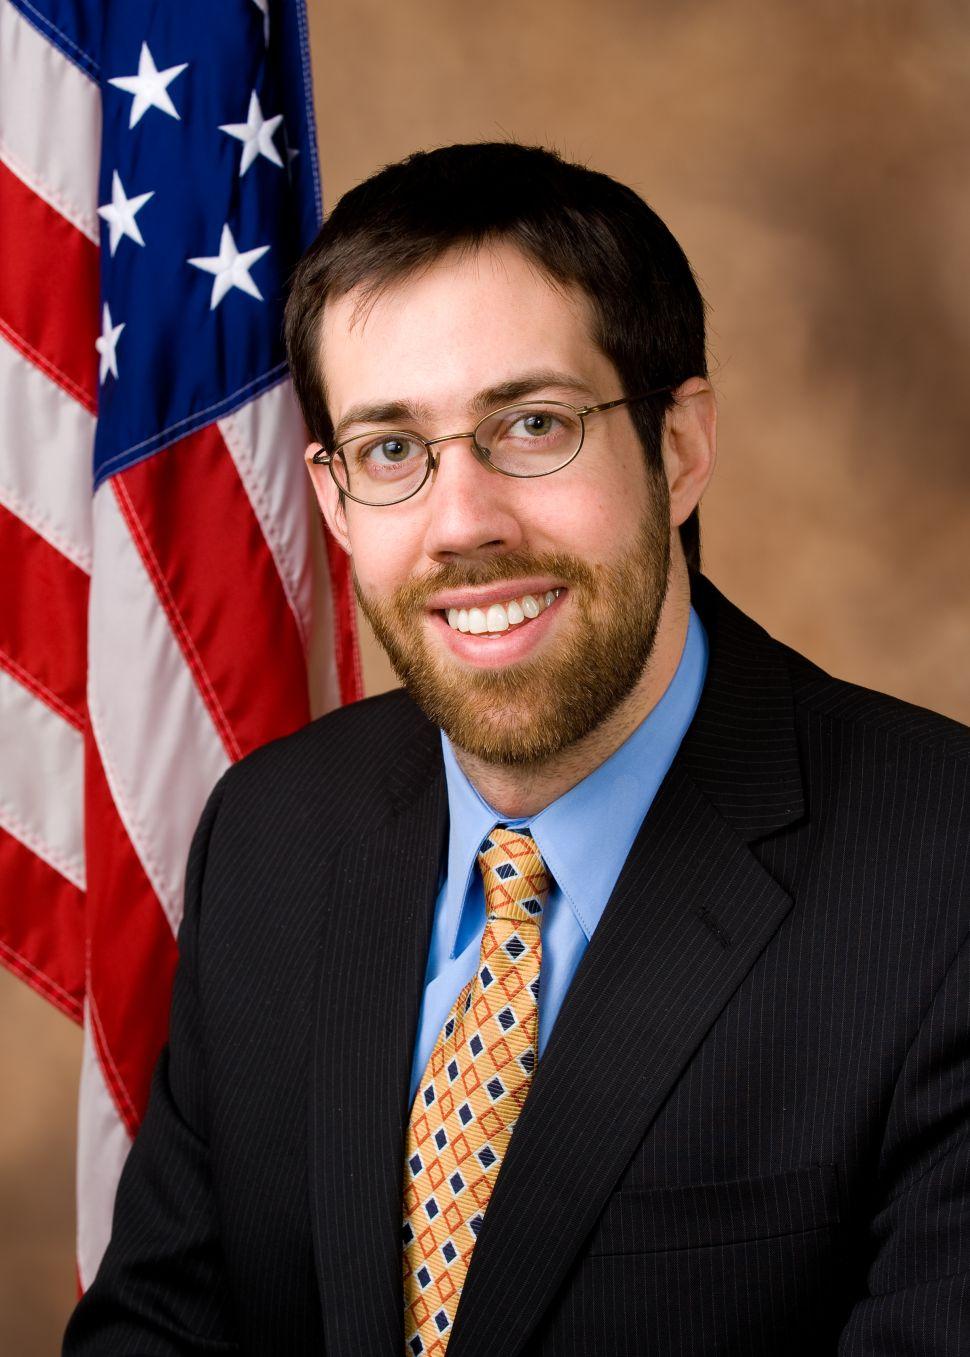 Senator Daniel Squadron: 'Partisan Redistricting is a Poisonous Process'